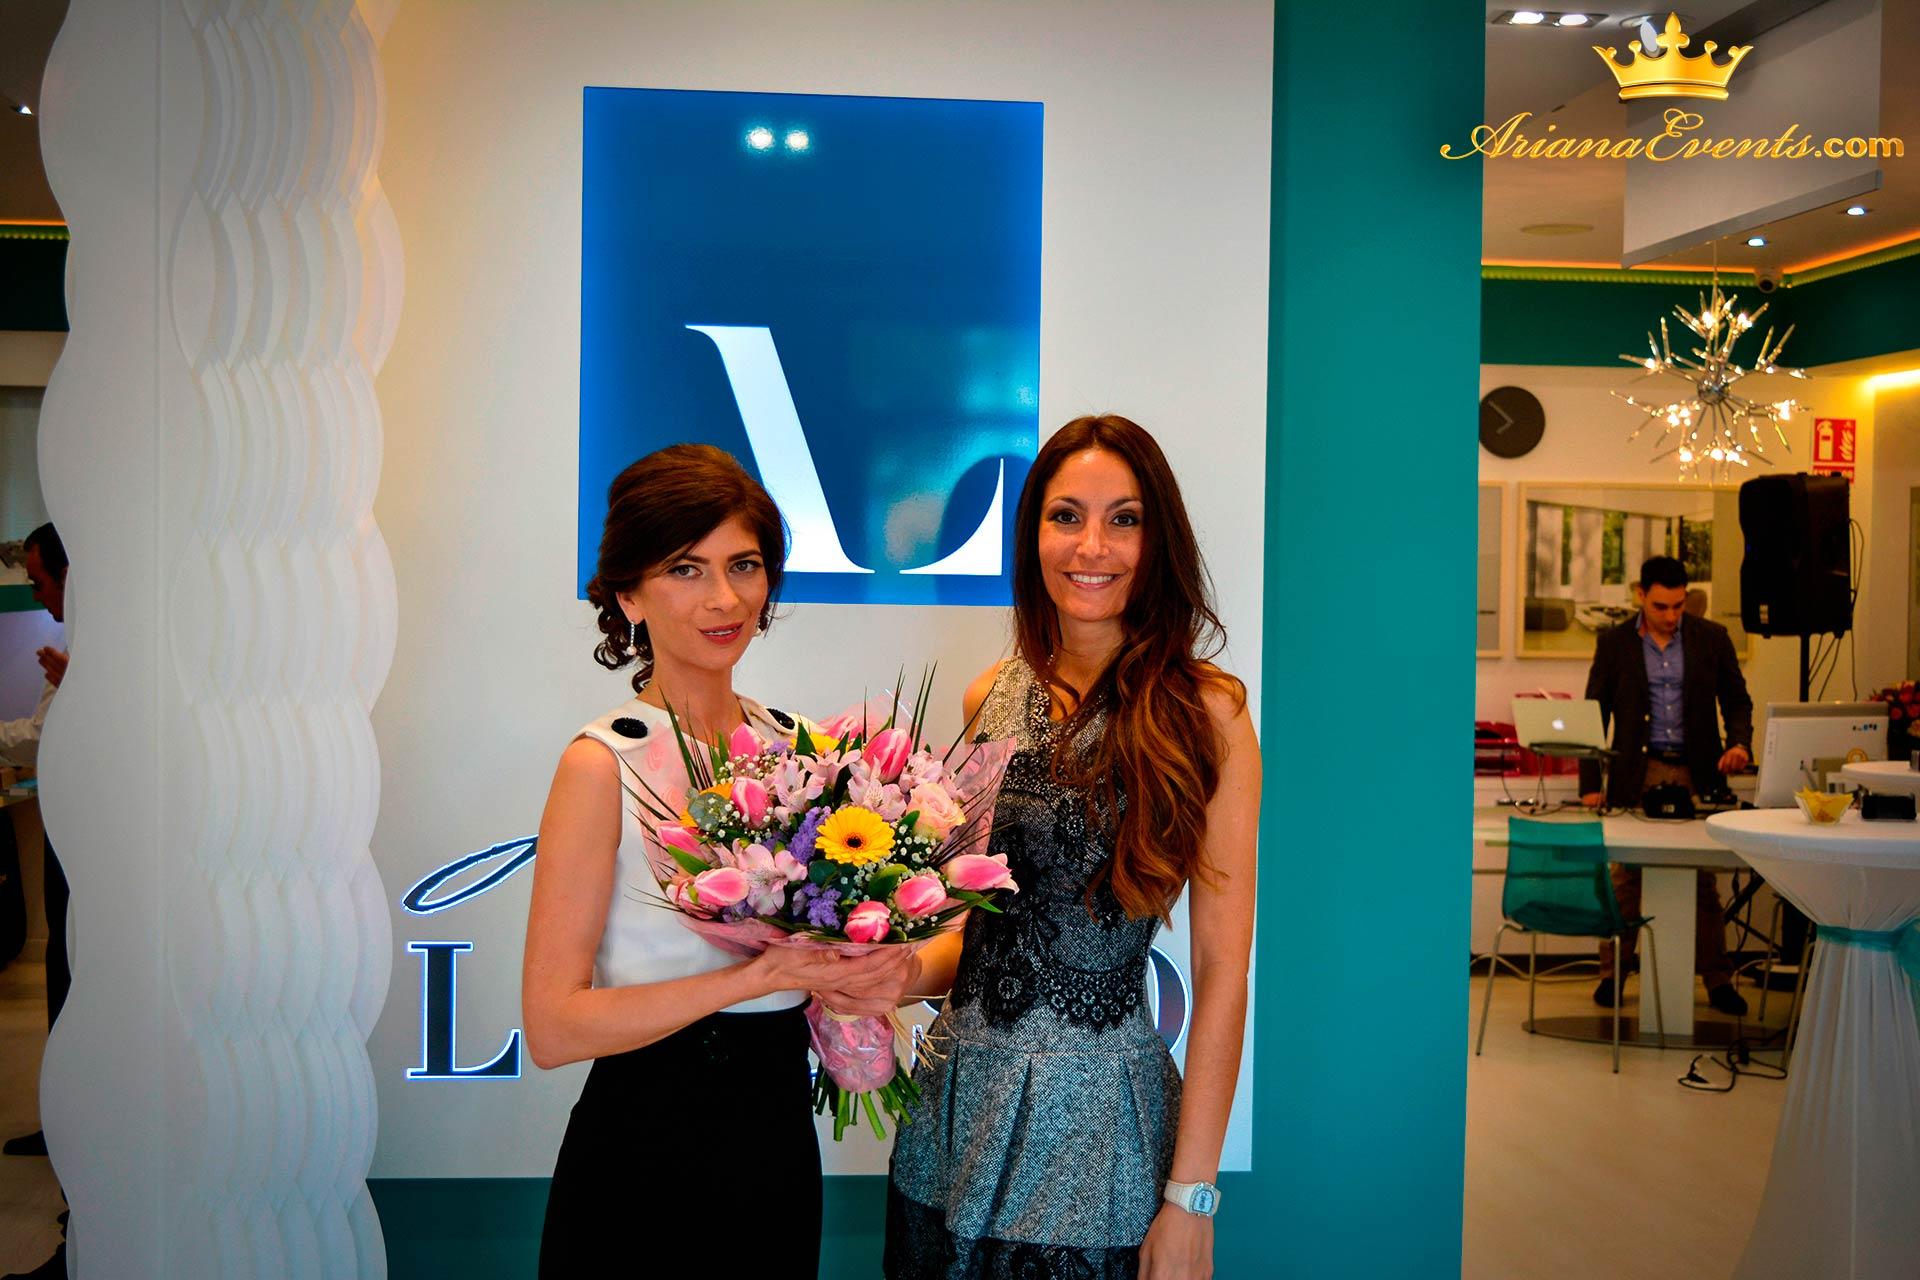 Ariana & Svetlana - Arte del Lusso Opening Party www.arianaevents.com